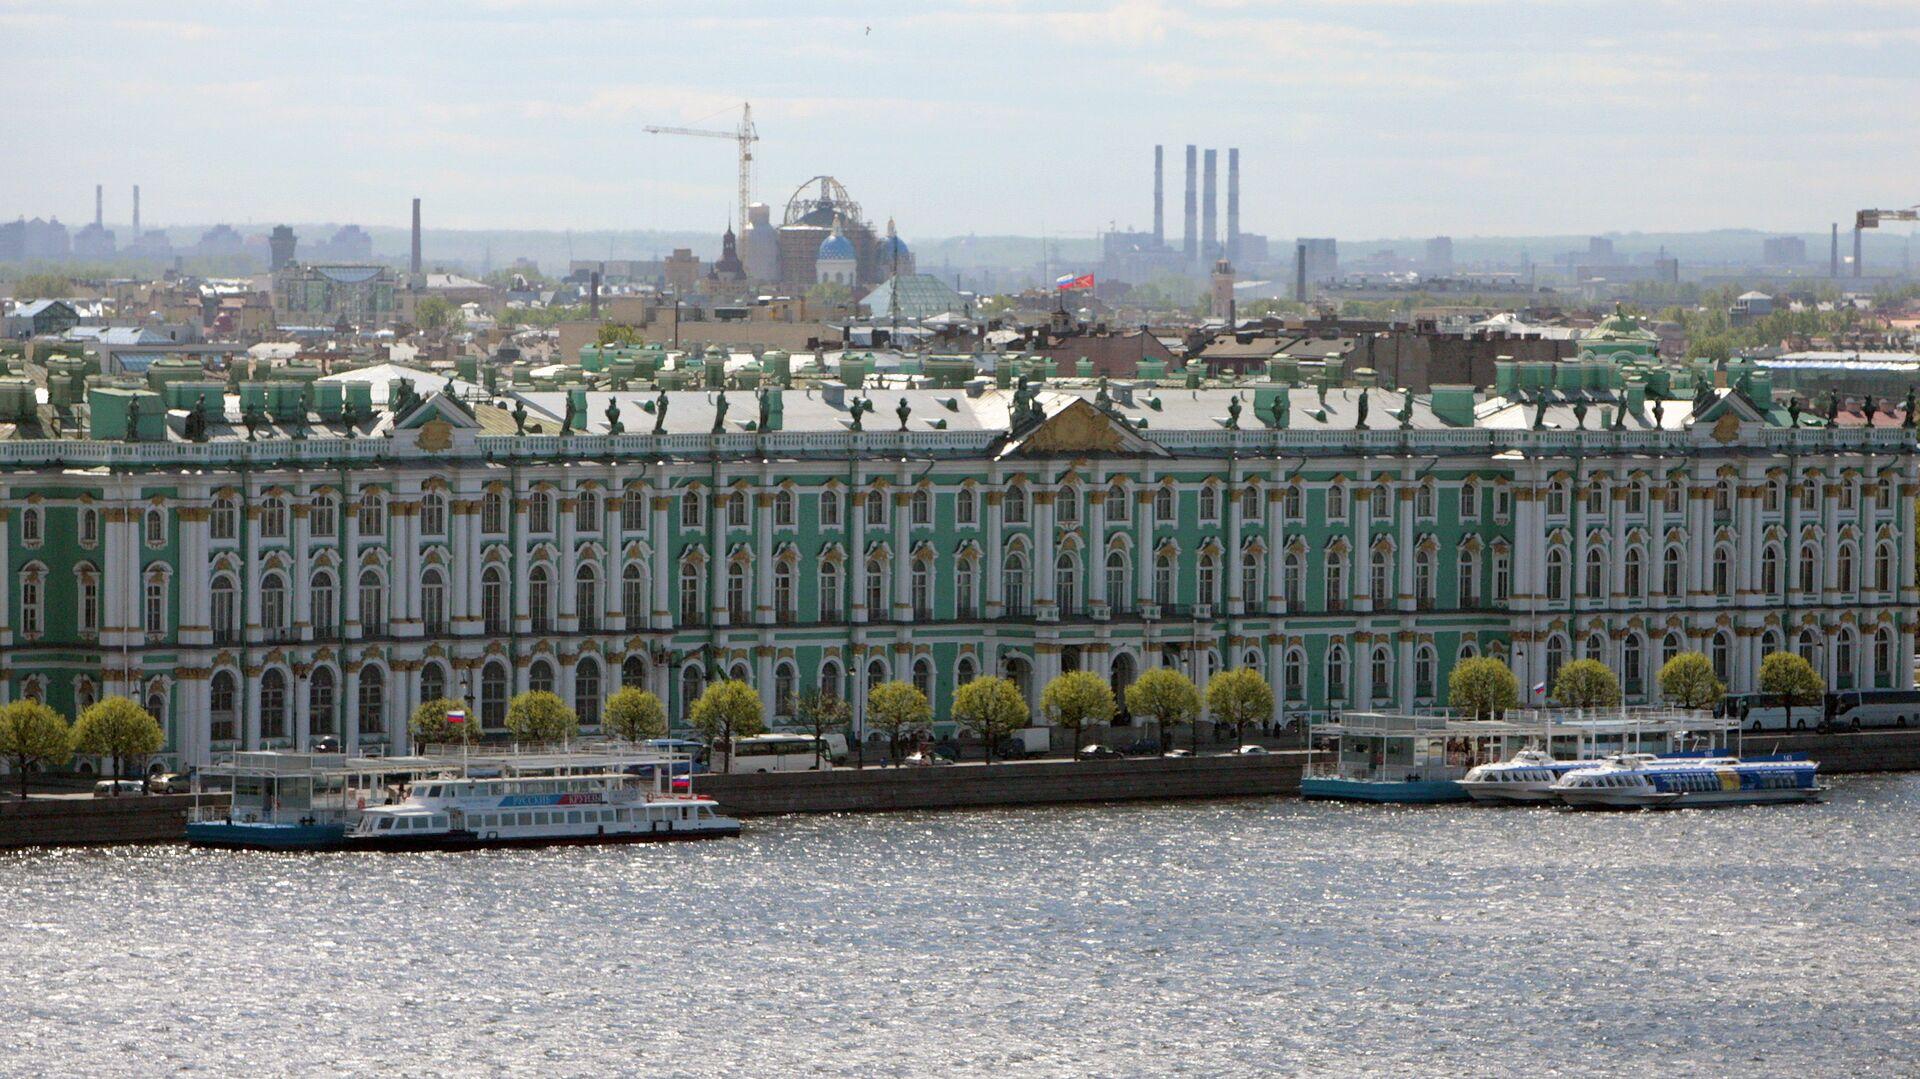 Museo Hermitage en San Petersburgo - Sputnik Mundo, 1920, 13.10.2021